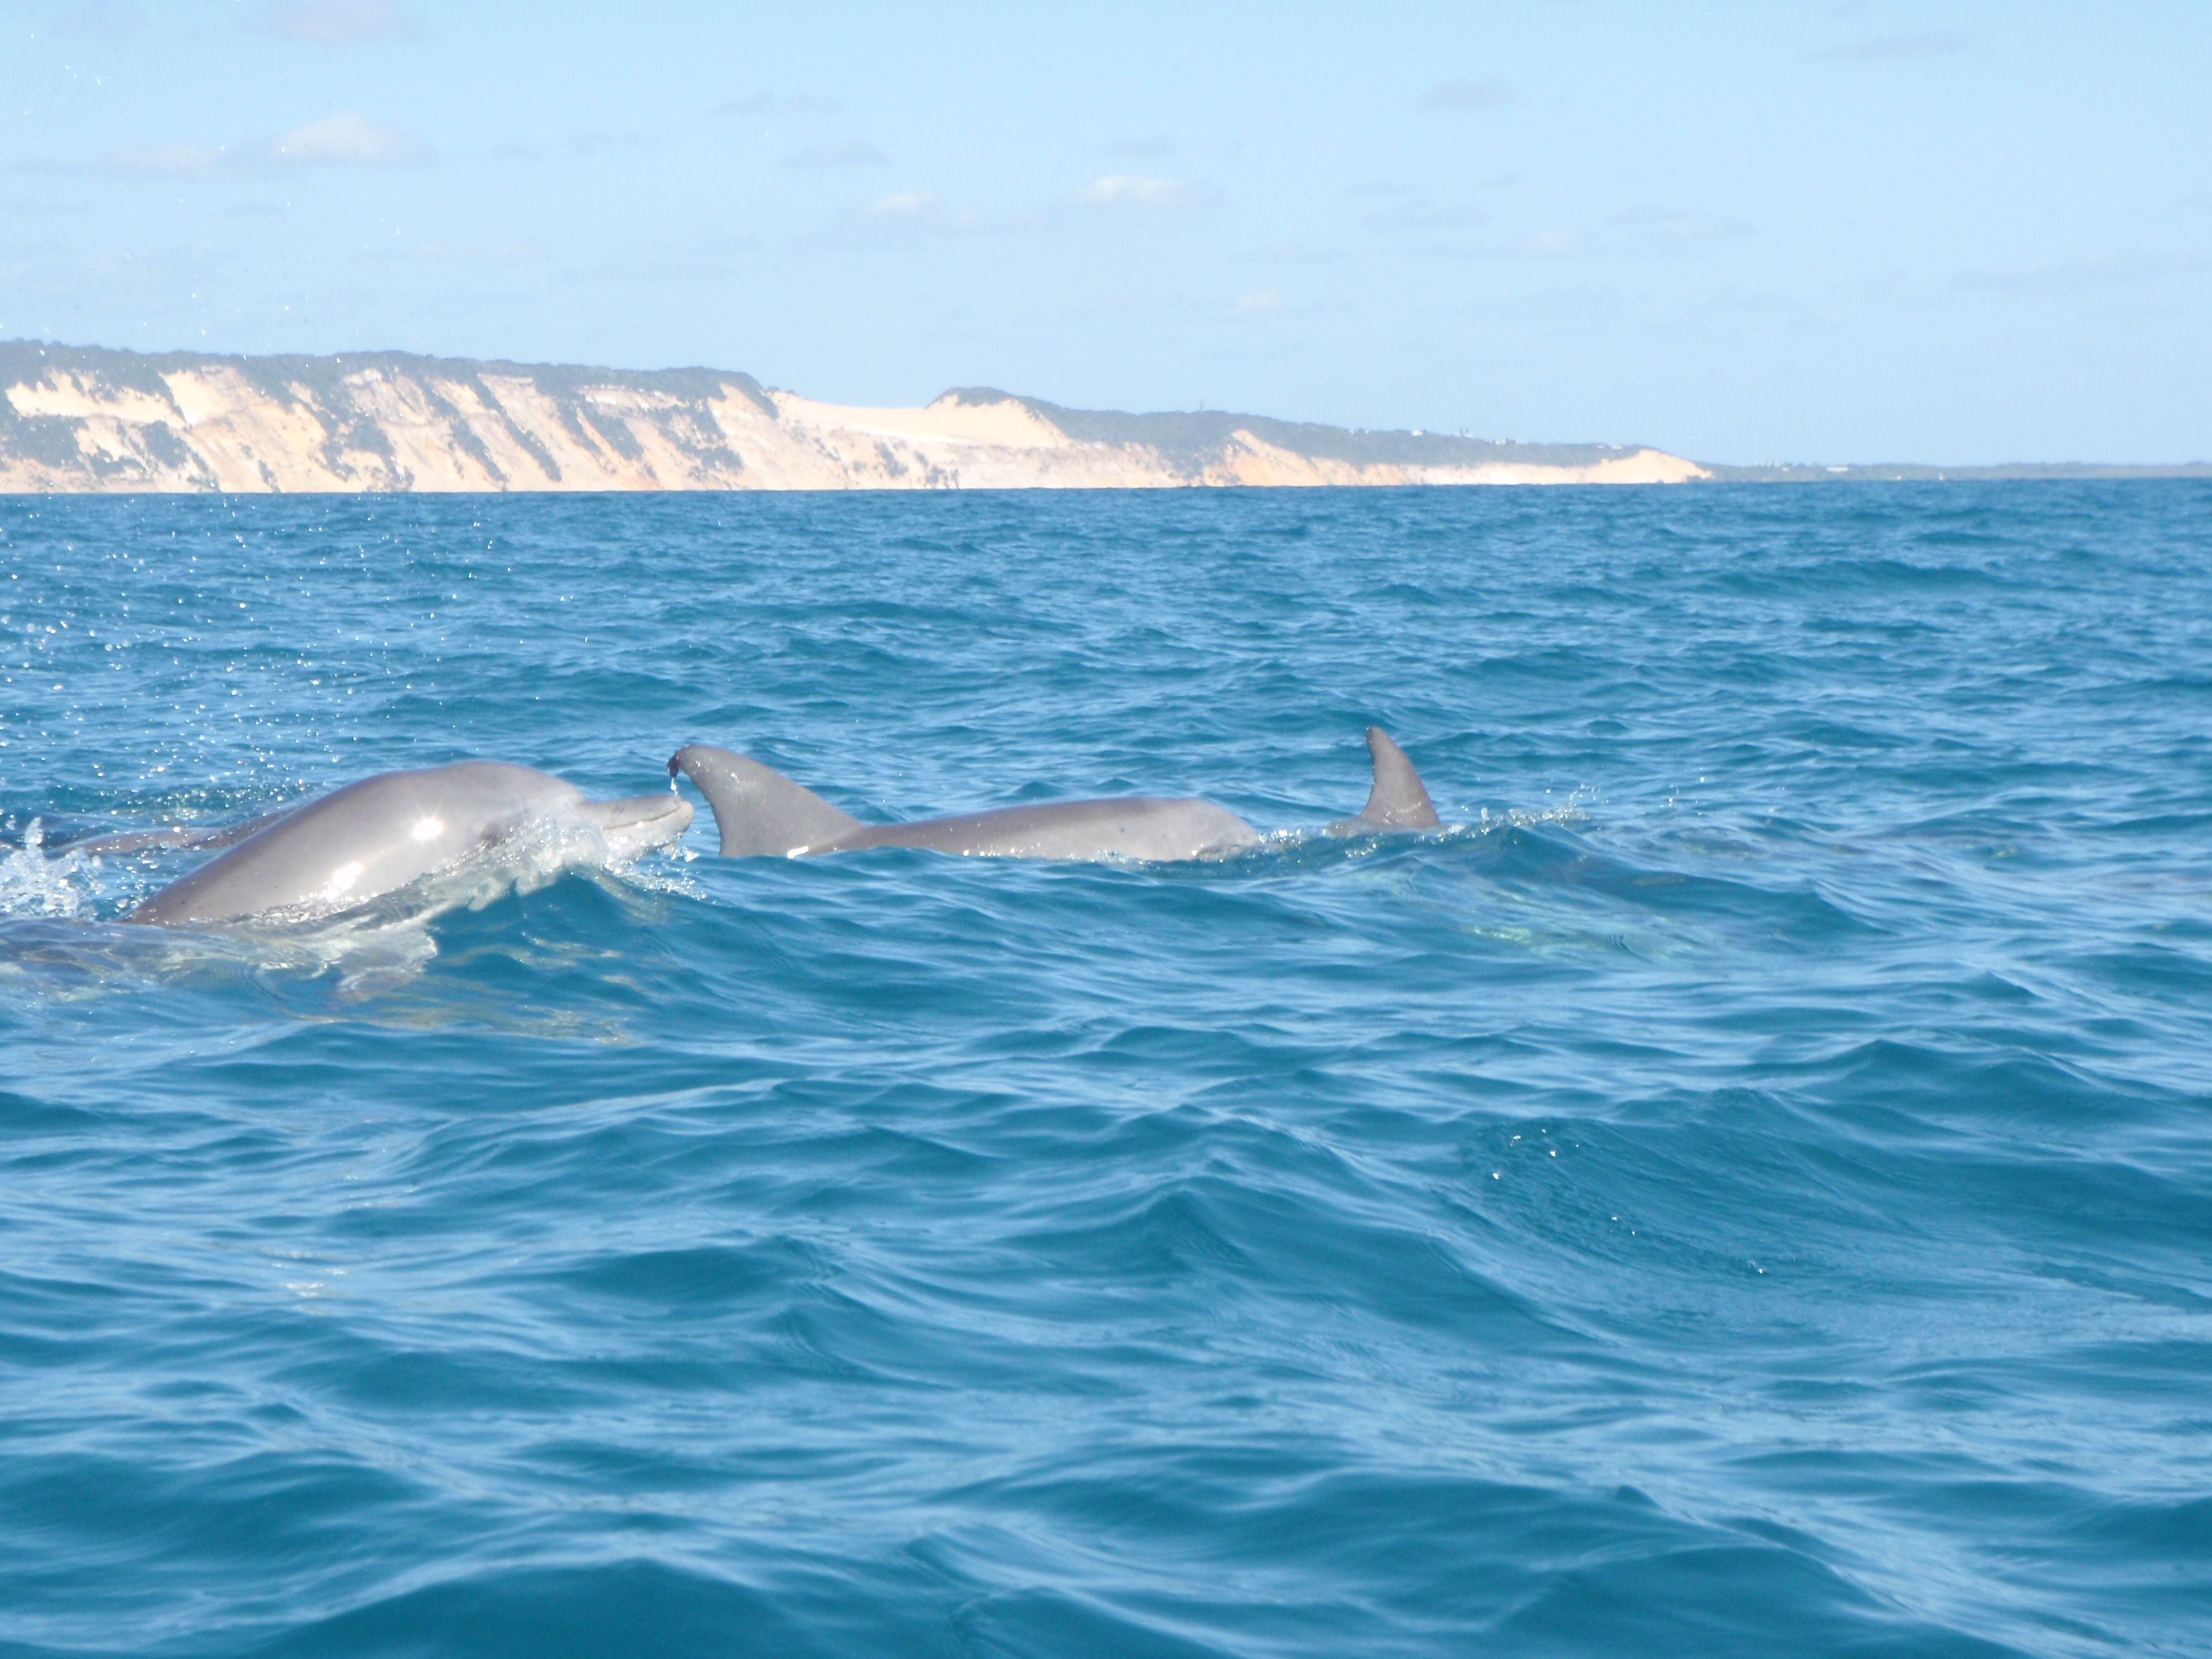 Rainbow Dolphin - Bing images